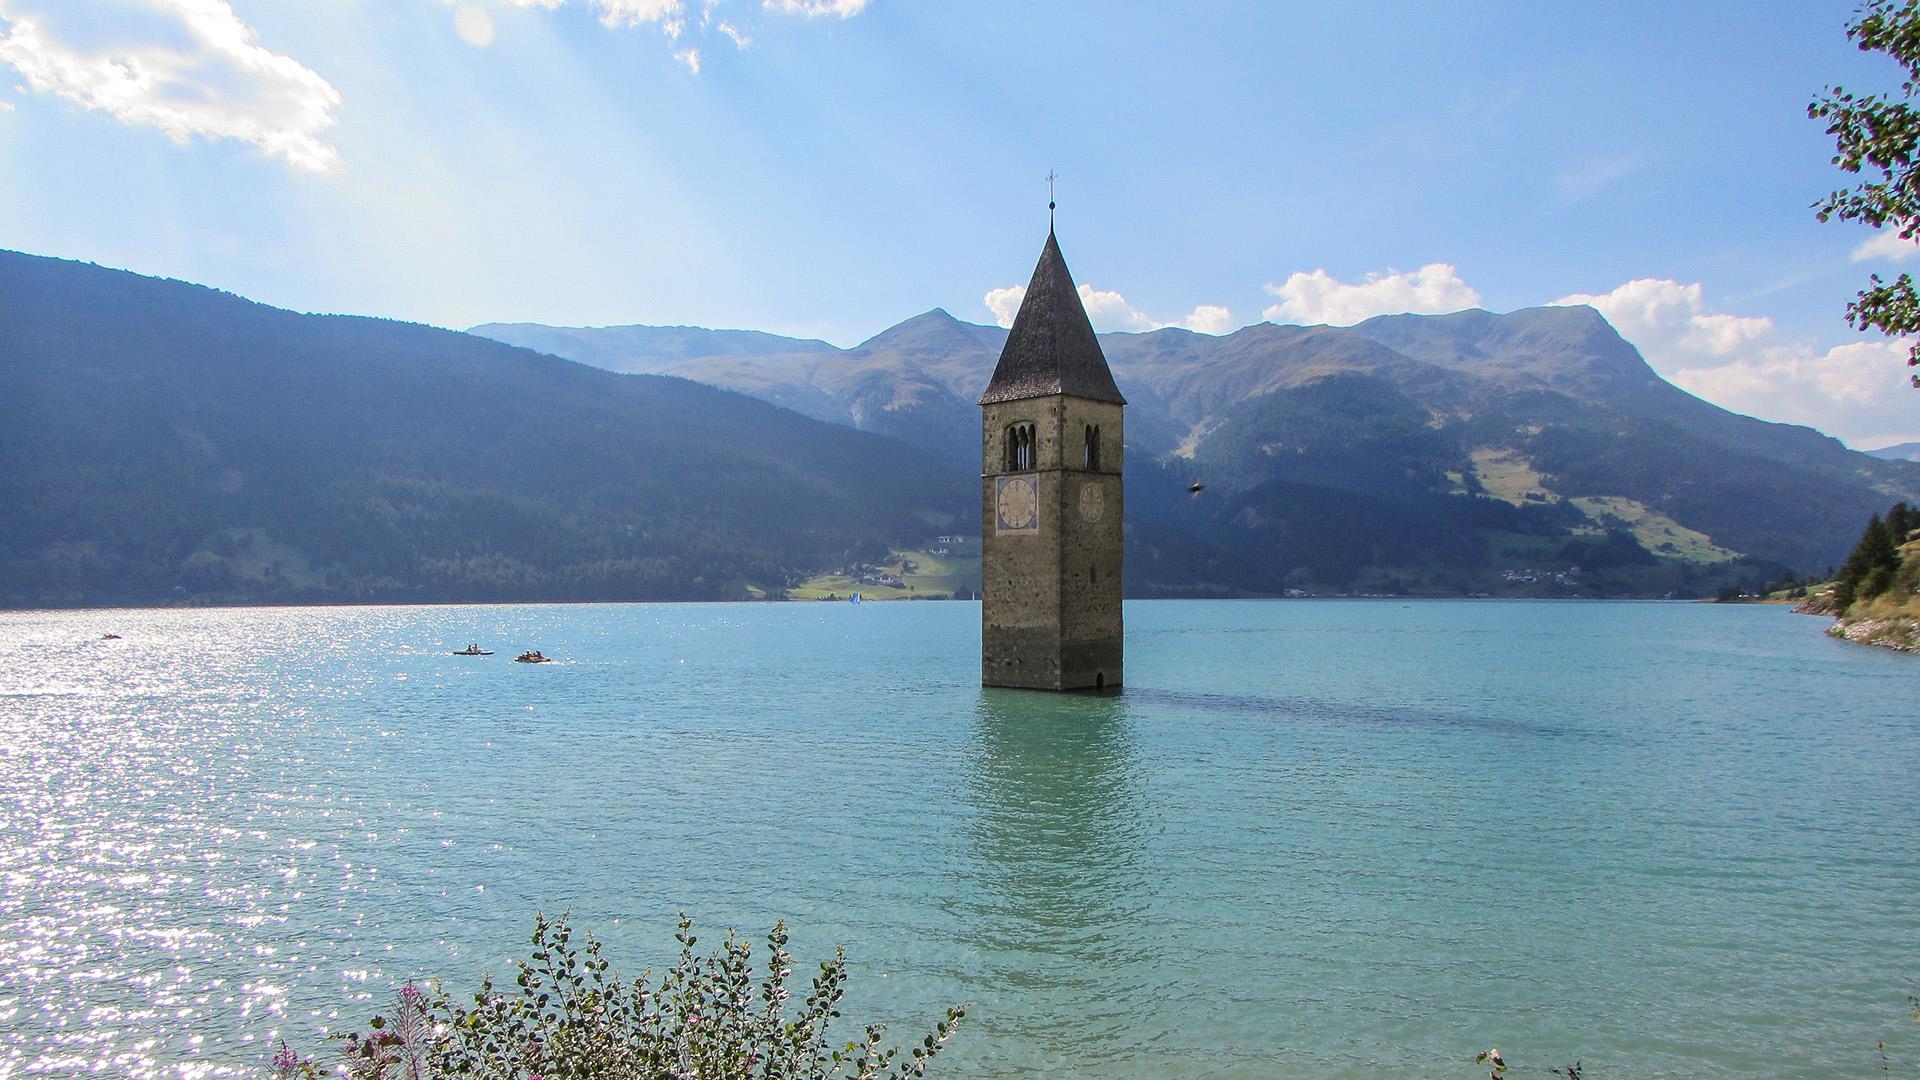 Lago_di_Resia_-_panorama_(21060362932)